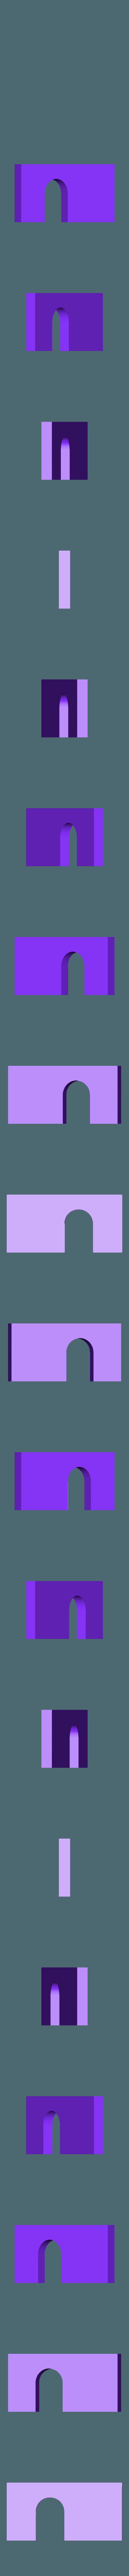 Rasptop_2.0_wire.stl Download free STL file RaspTop 2.0 • Design to 3D print, EricsDIY